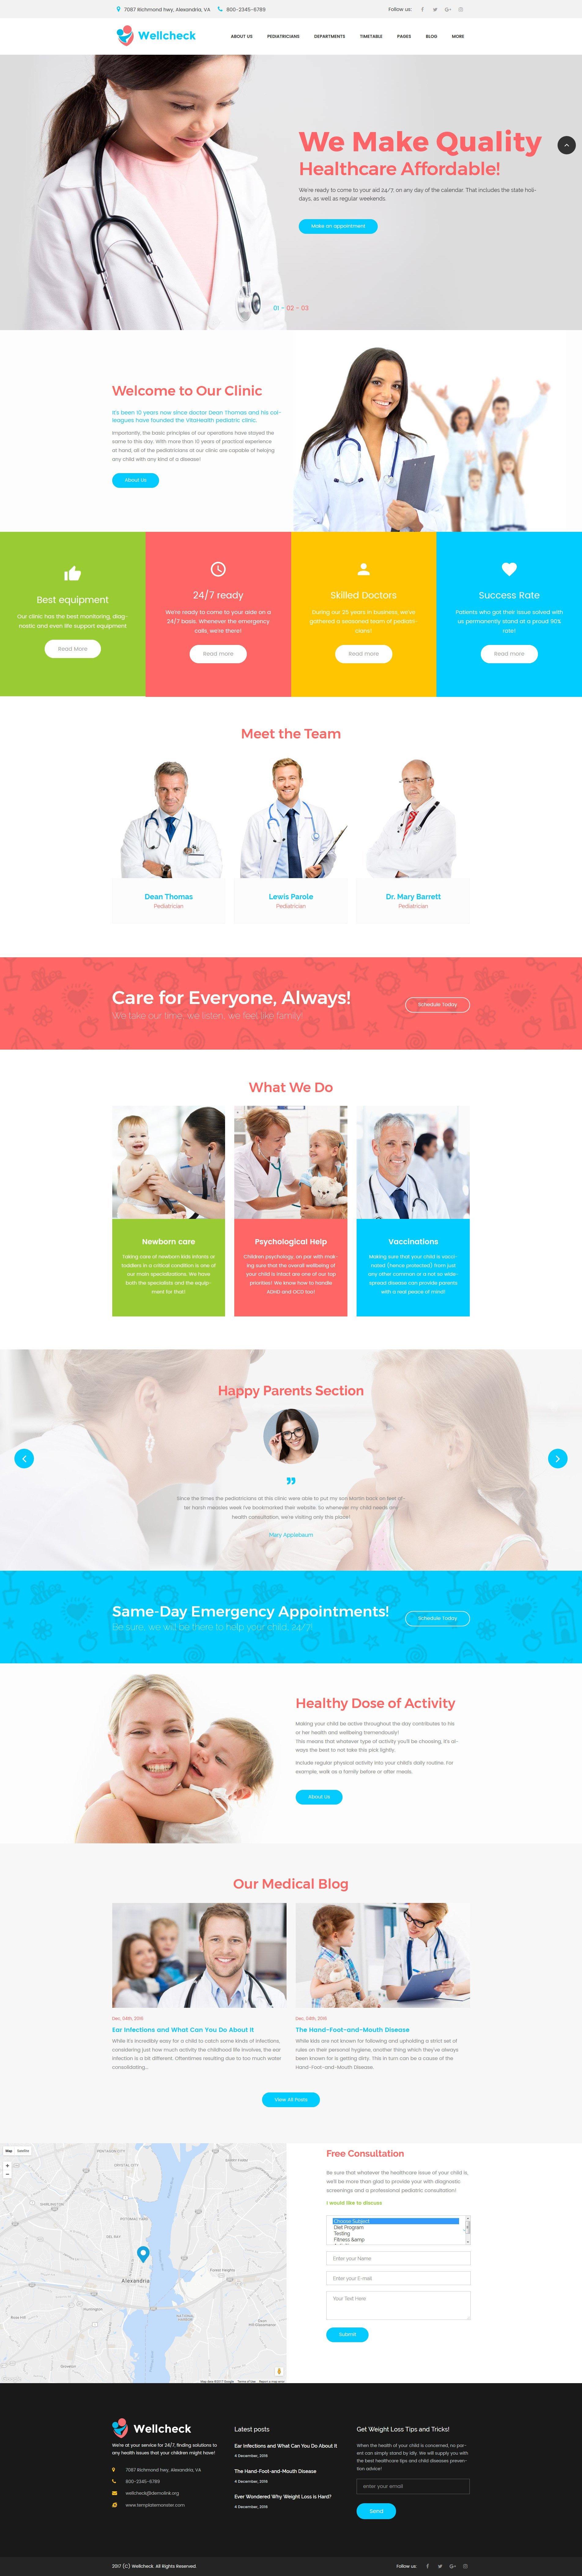 Wellcheck - Pediatric Clinic WordPress Theme - screenshot